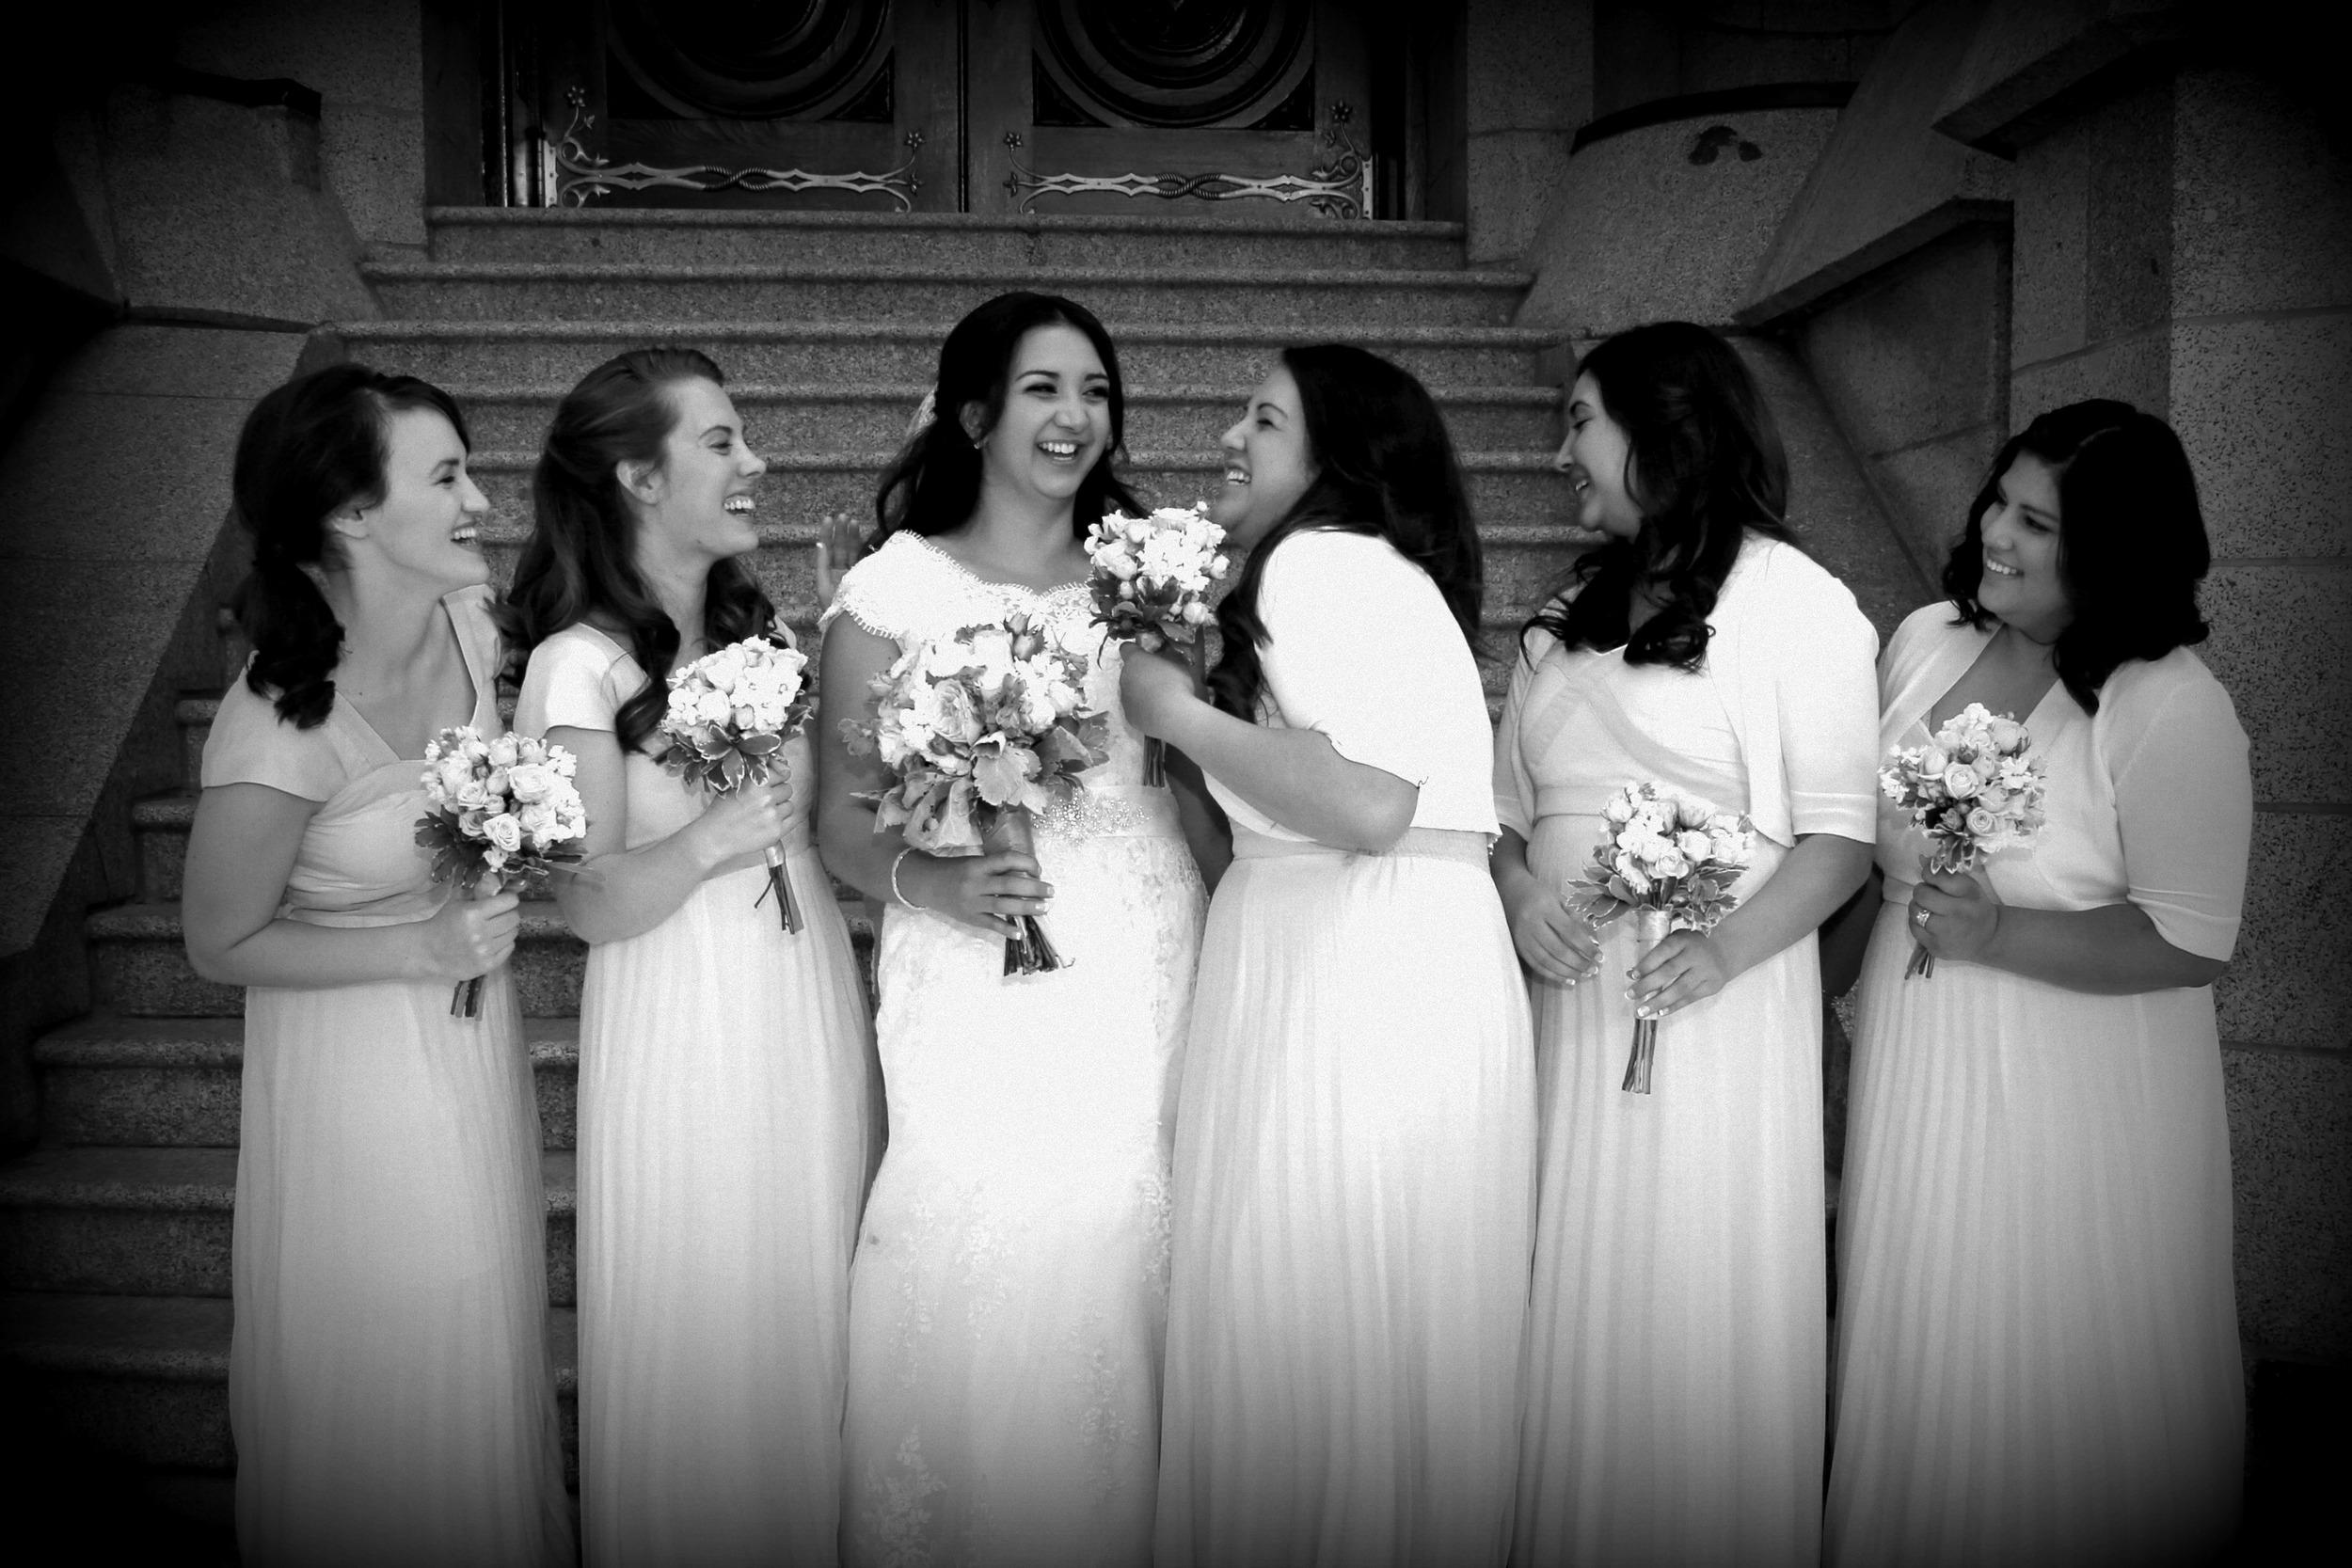 Salt Lake Bride maids at the LDS Salt Lake Temple